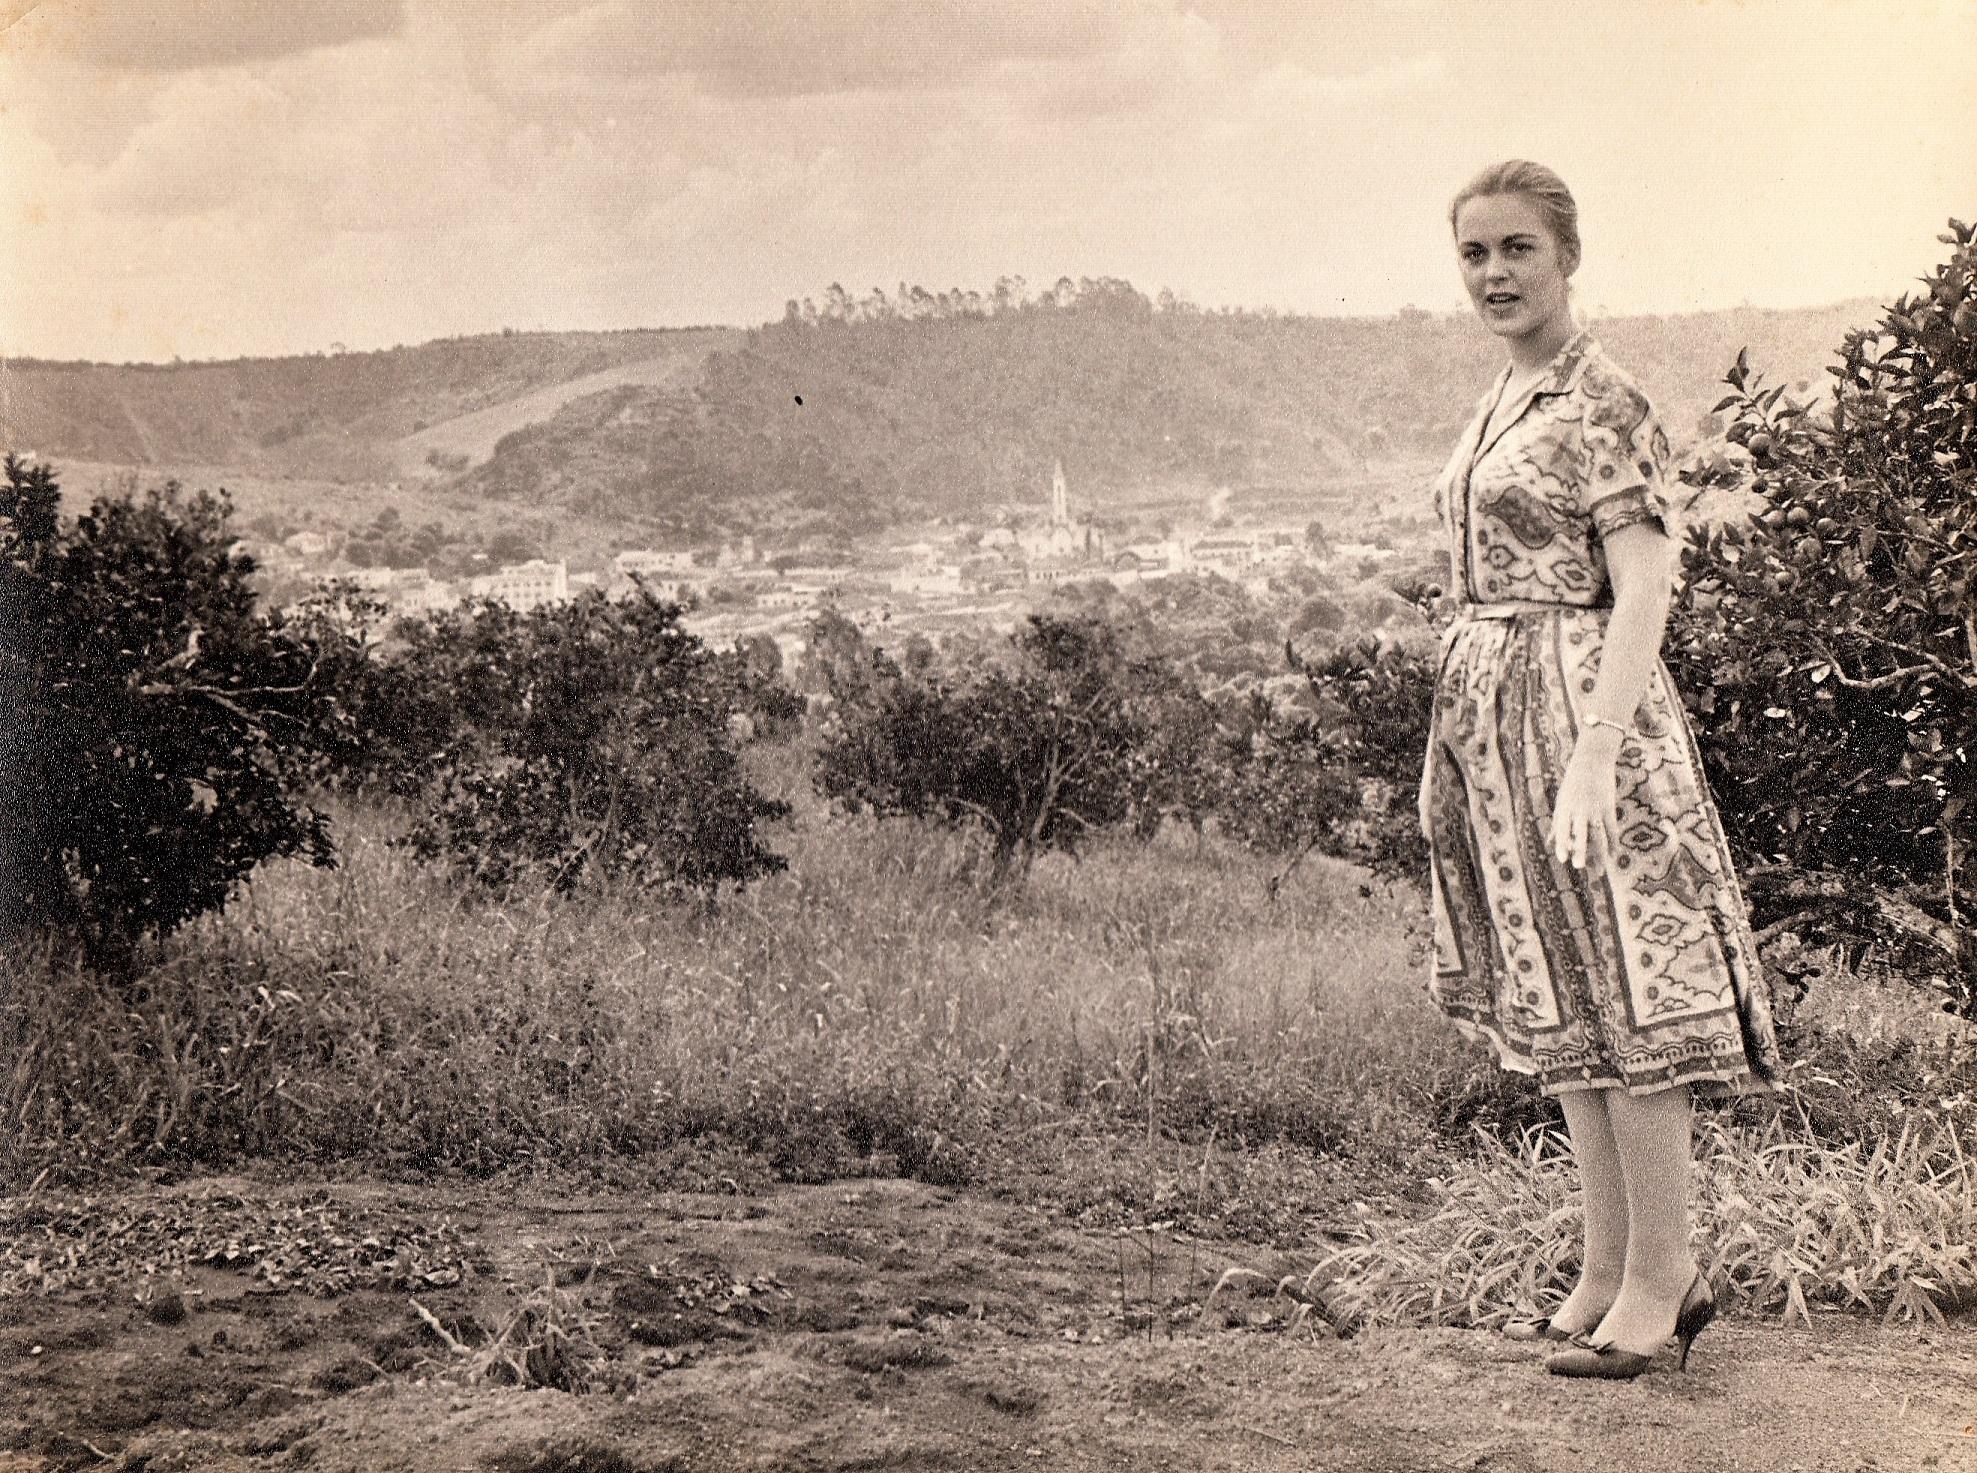 Joanne in Viçosa, Brazil - 1961